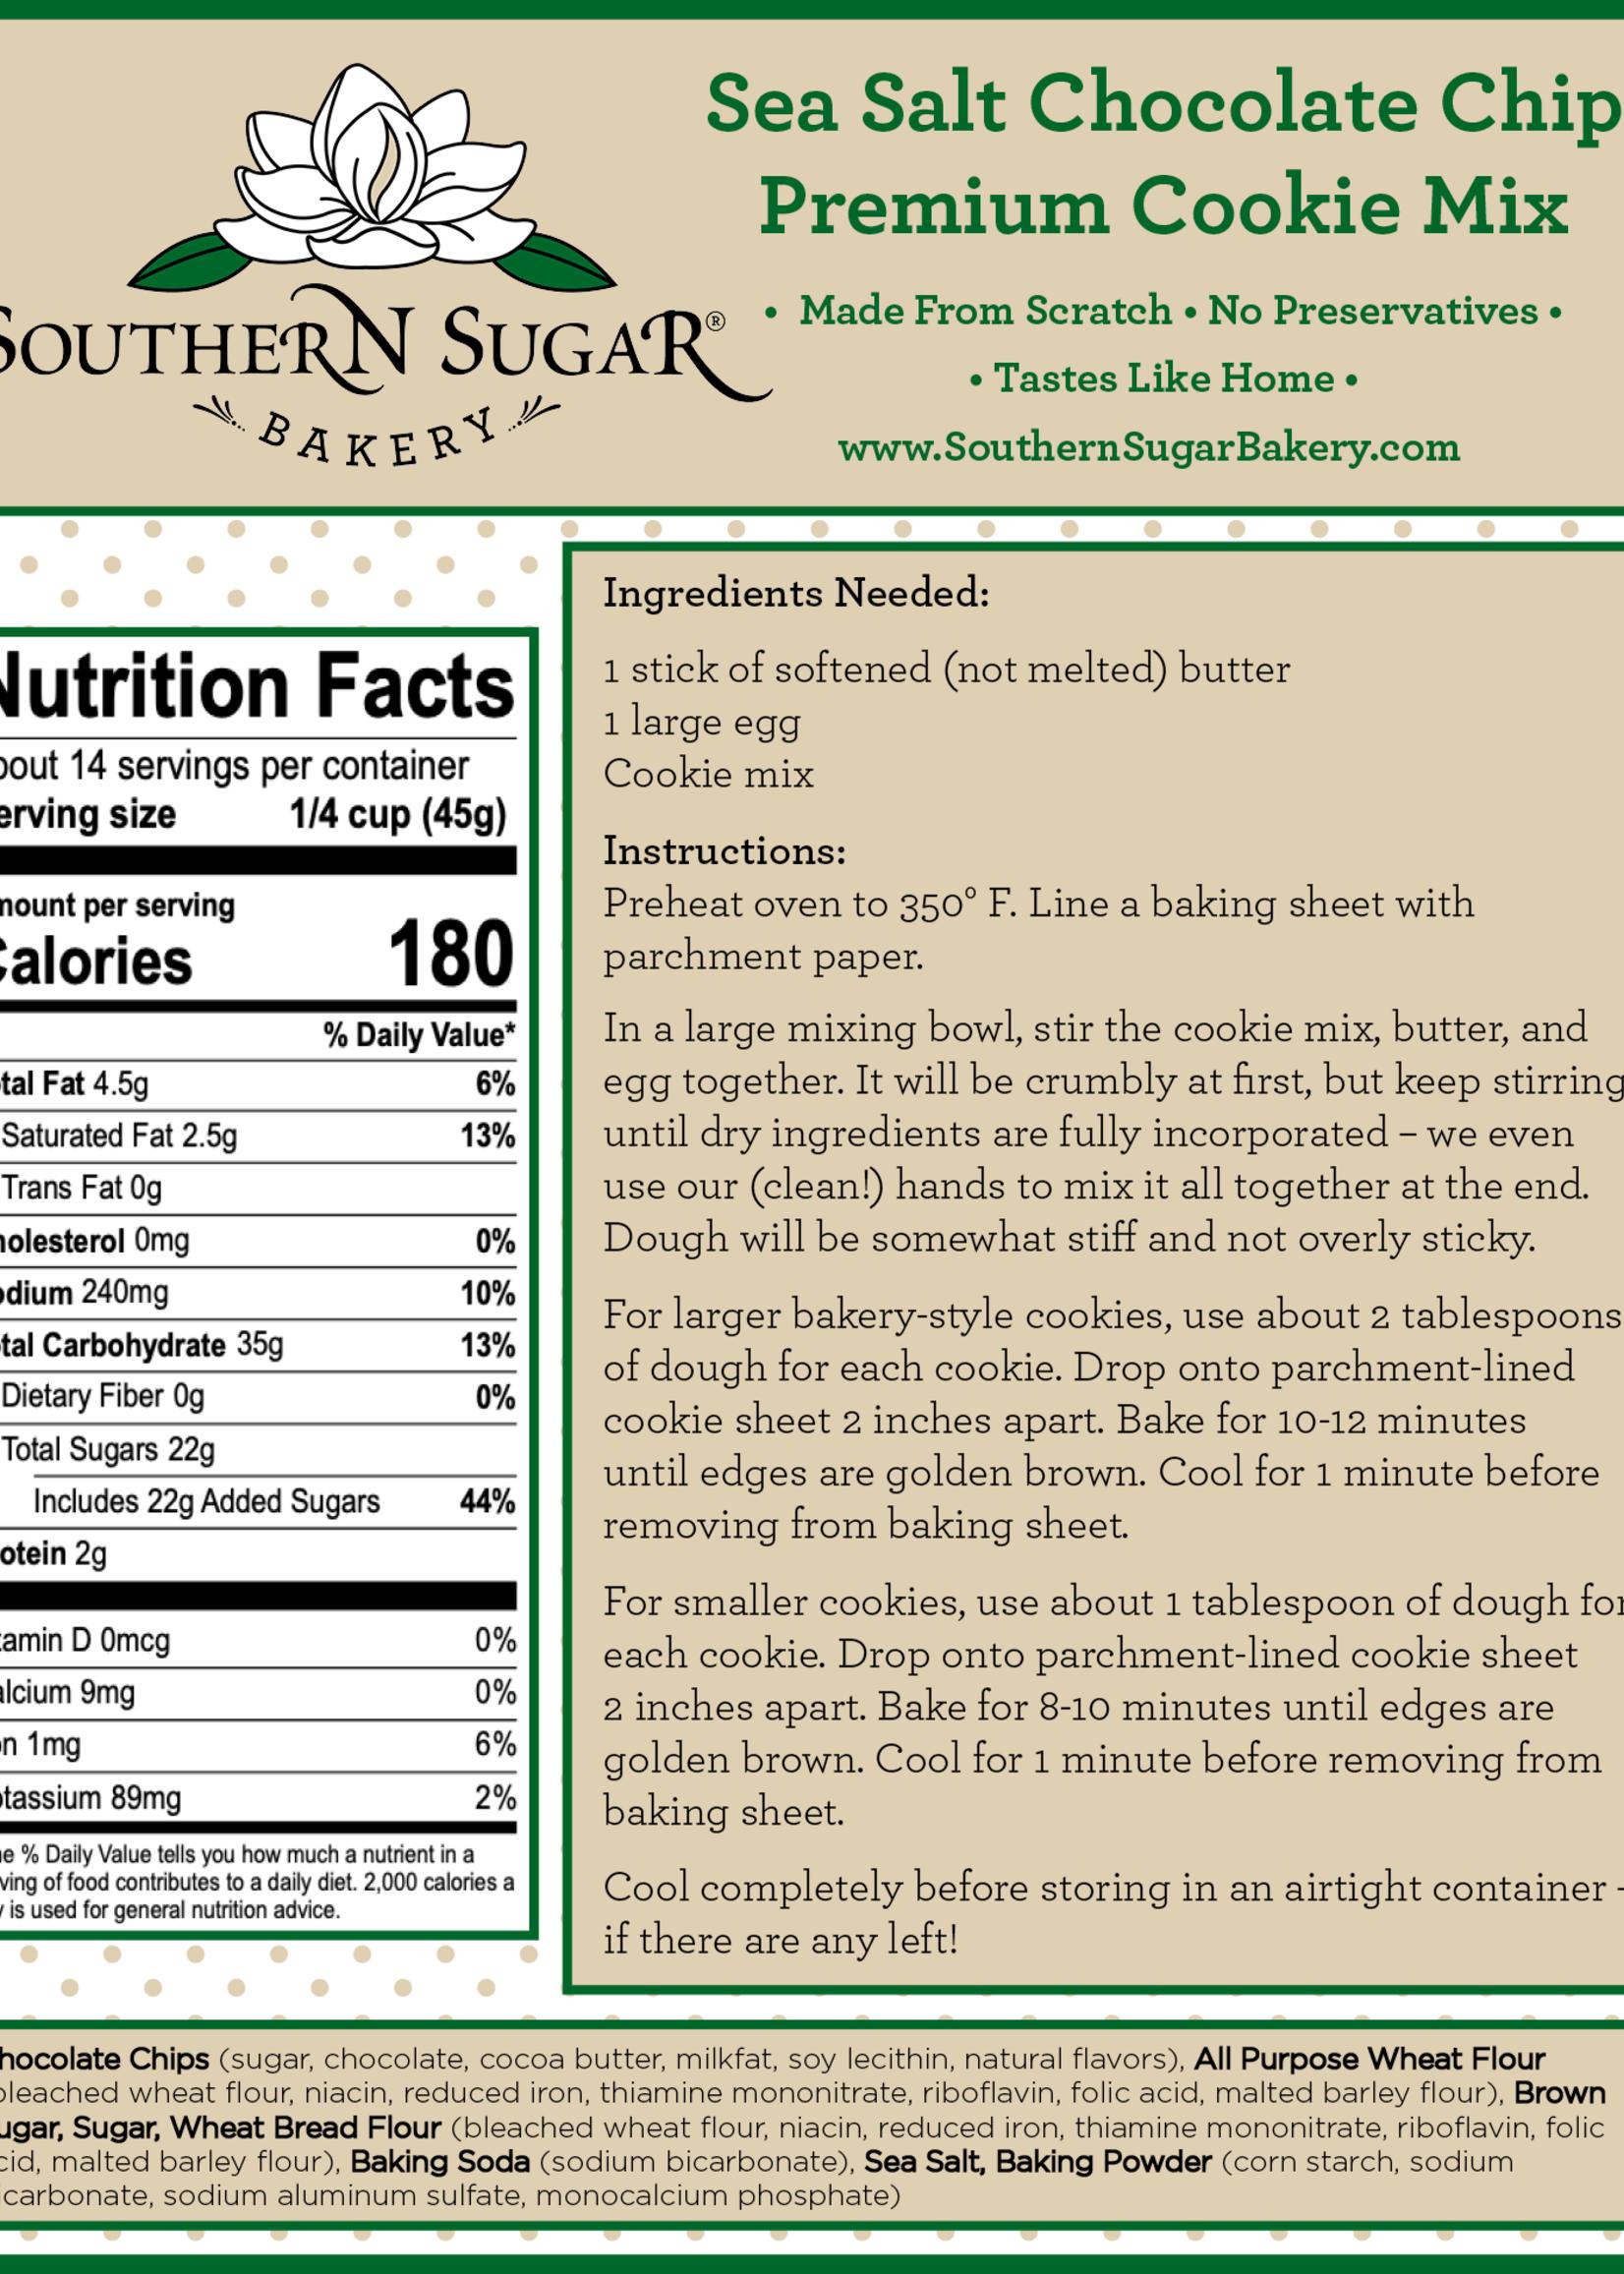 Southern Sugar Bakery Sea Salt Chocolate Chip Premium Cookie Mix